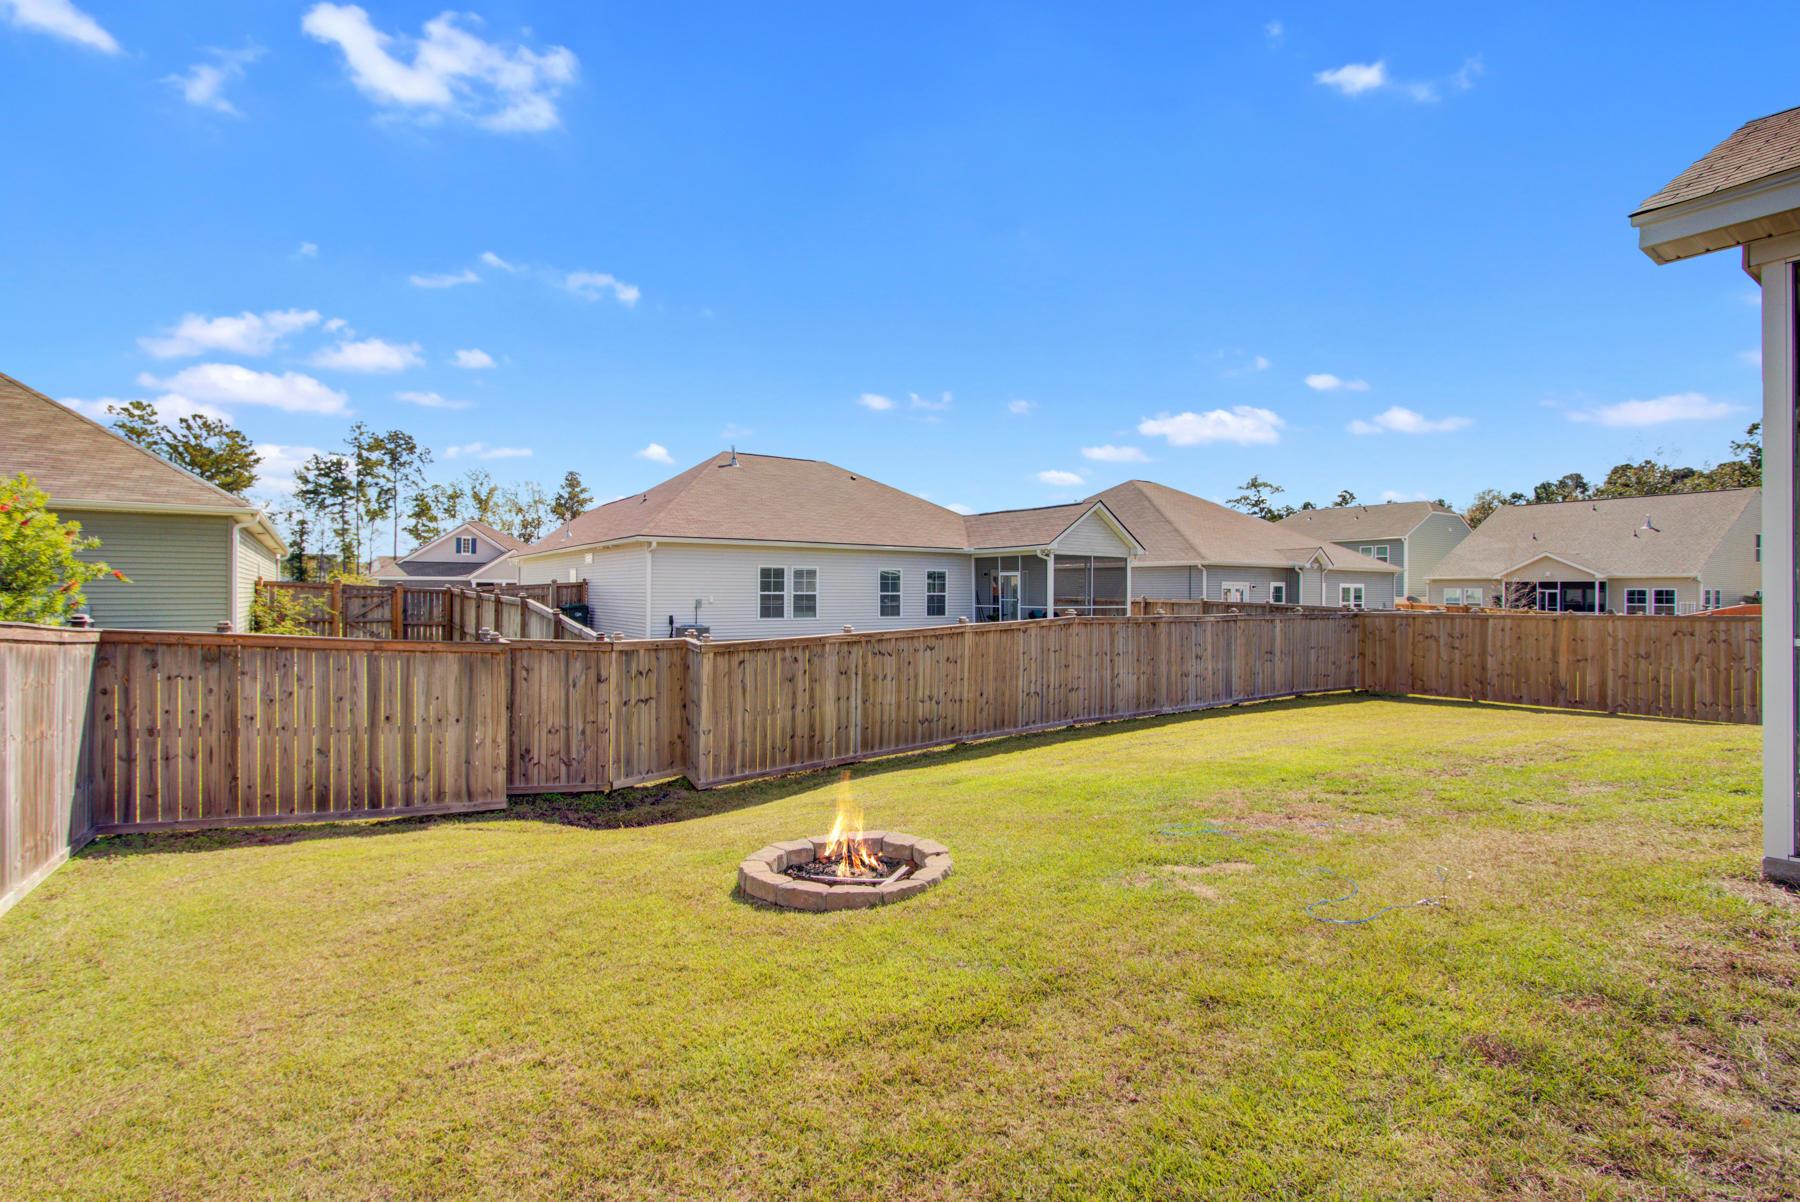 Brickhope Plantation Homes For Sale - 616 Zinnia, Goose Creek, SC - 30